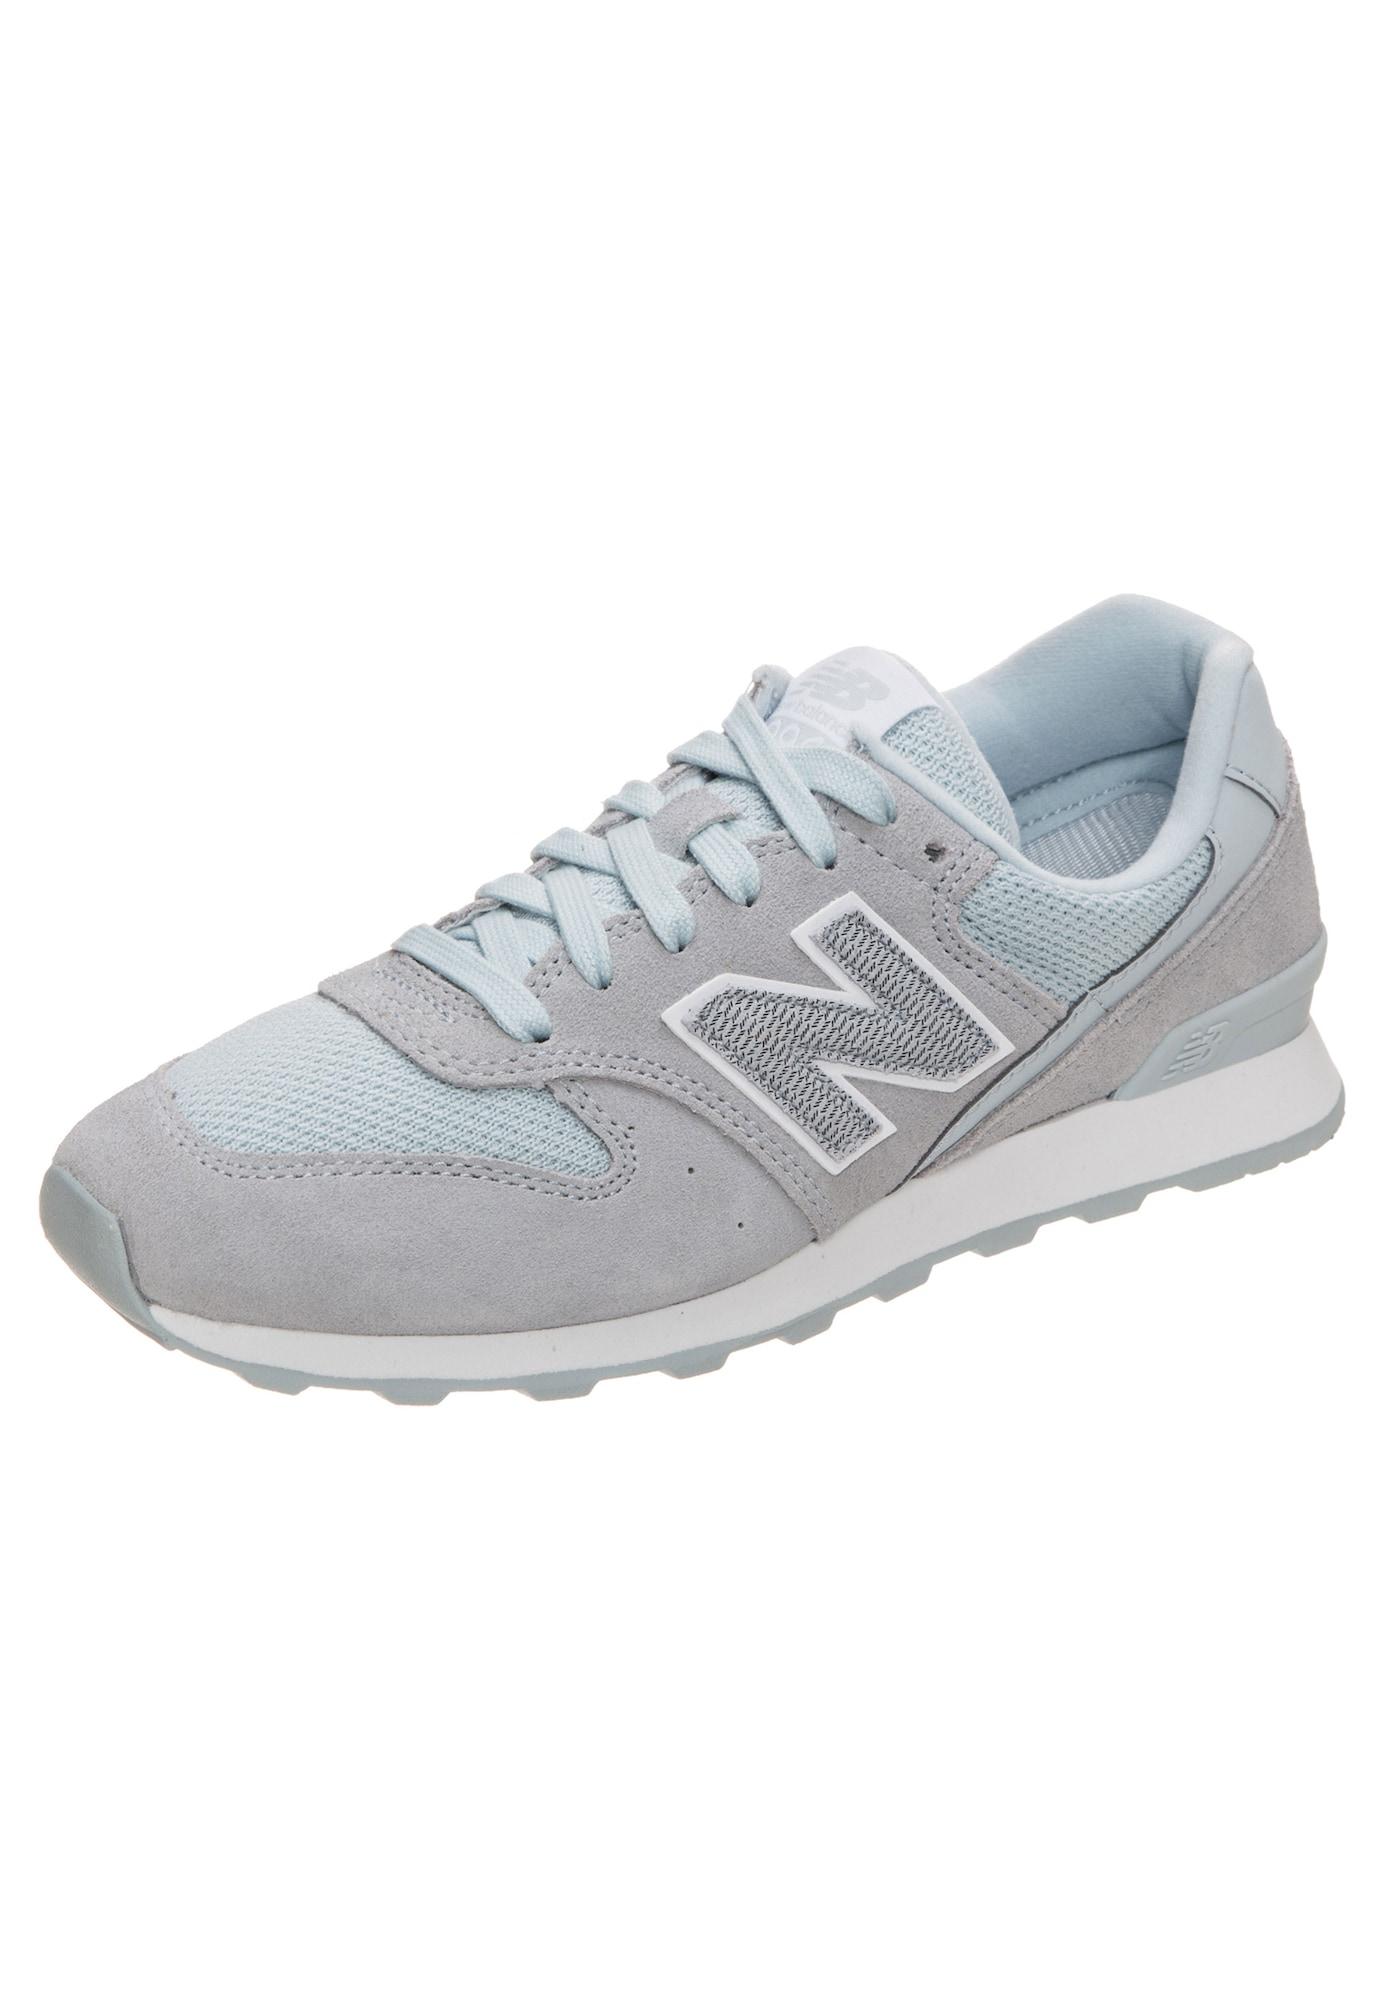 New Balance, Dames Sneakers laag 'WR996-LCC-D', lichtblauw / grijs